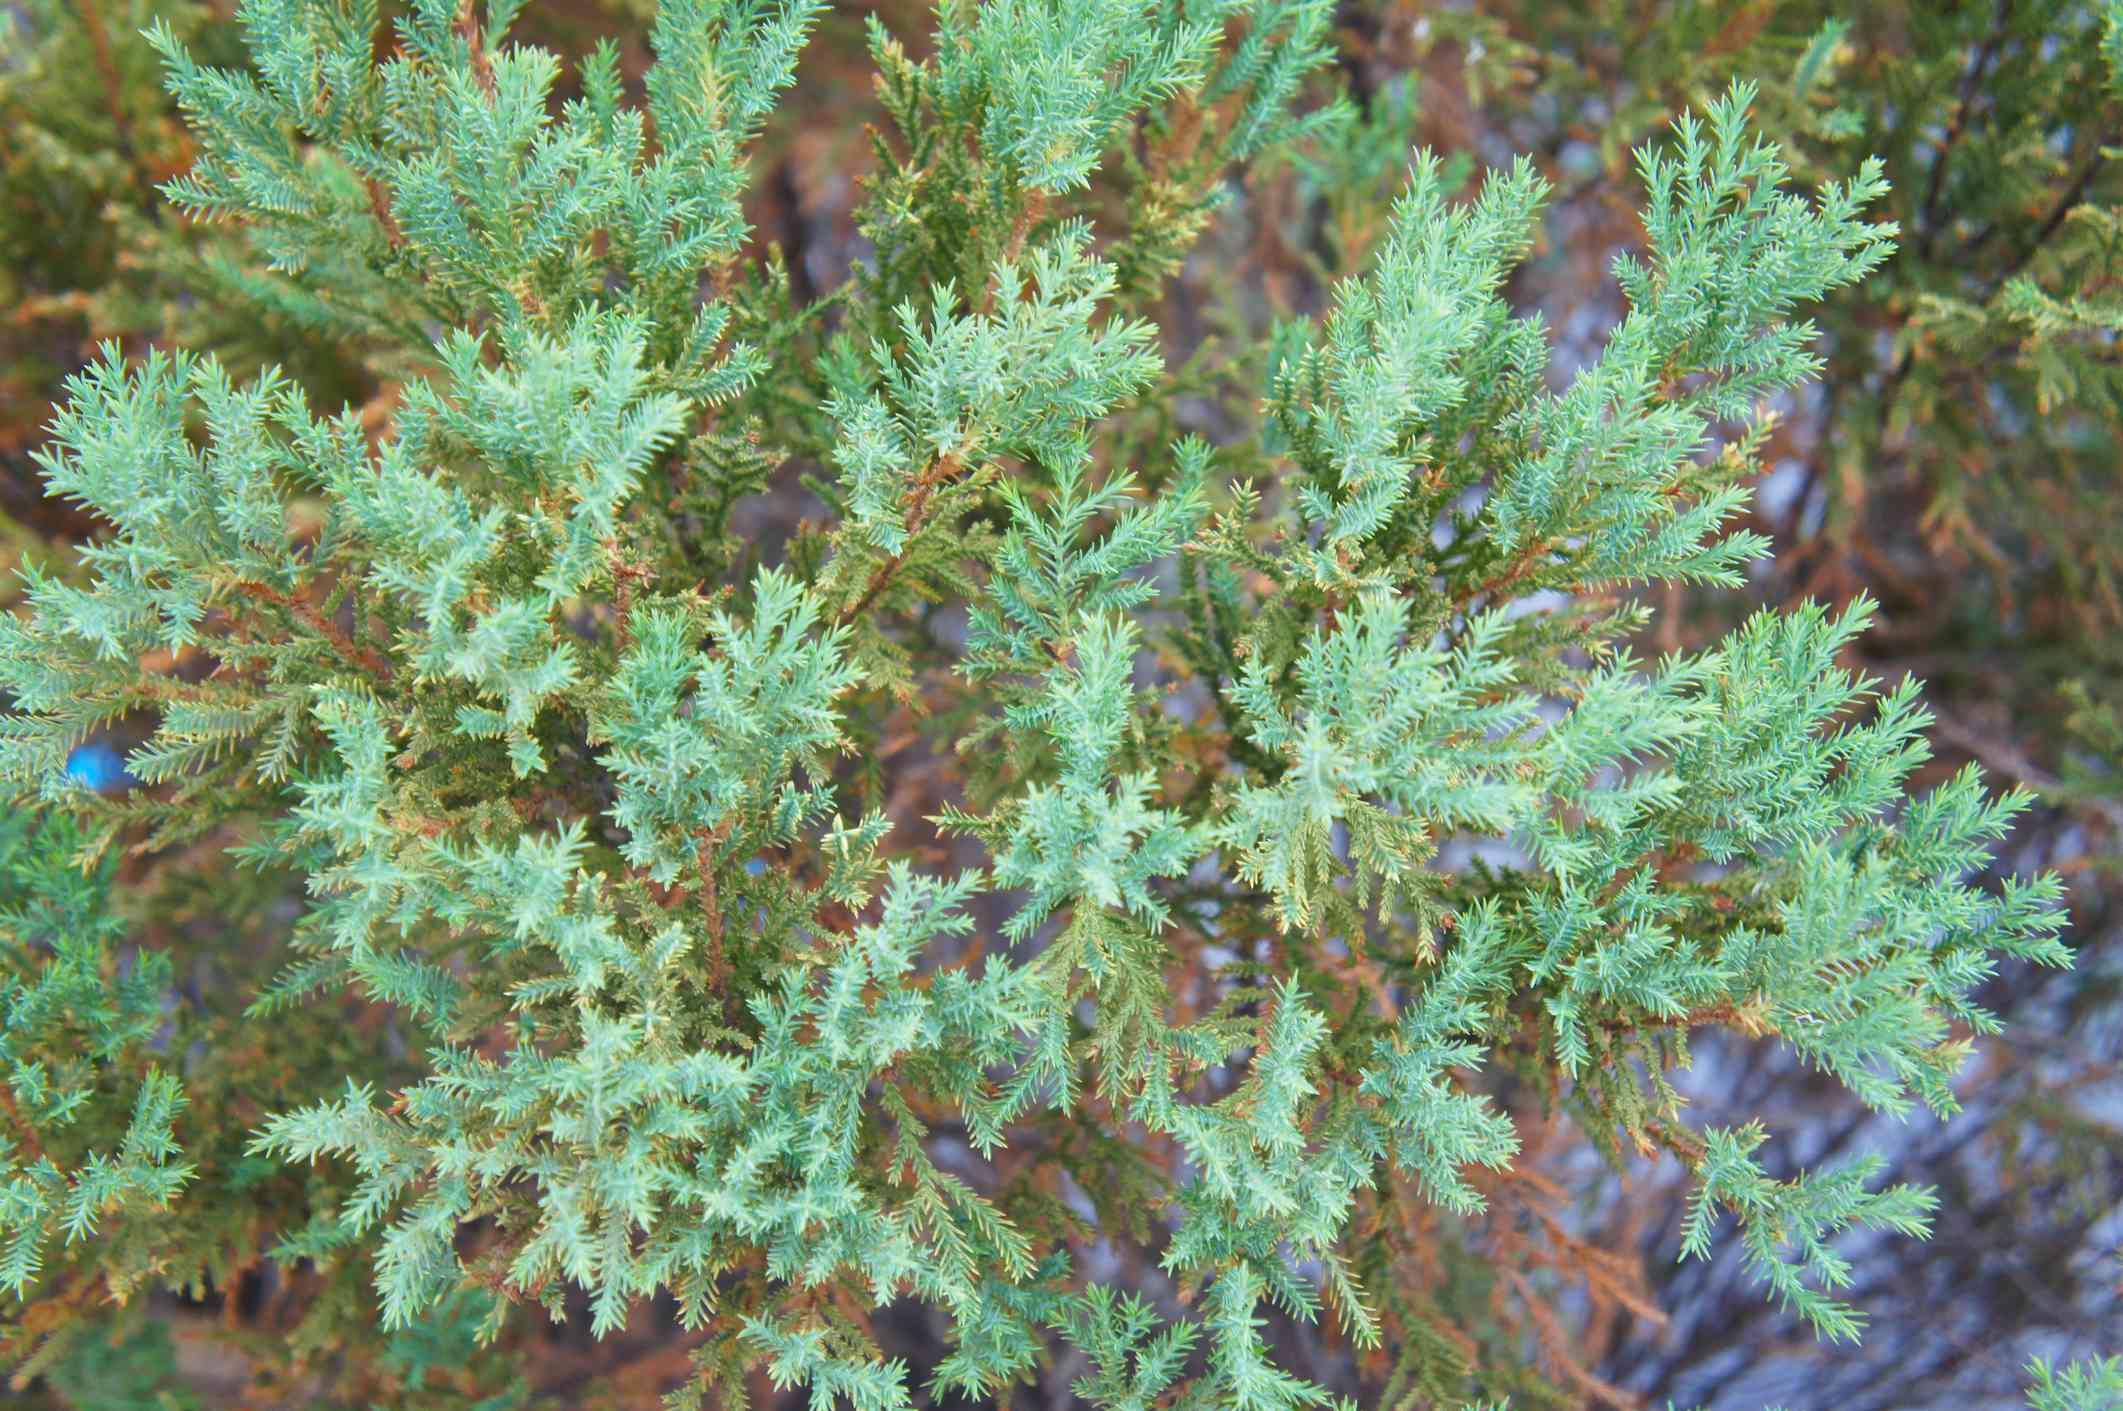 Juniperus squamata or flaky juniper blue star green plant